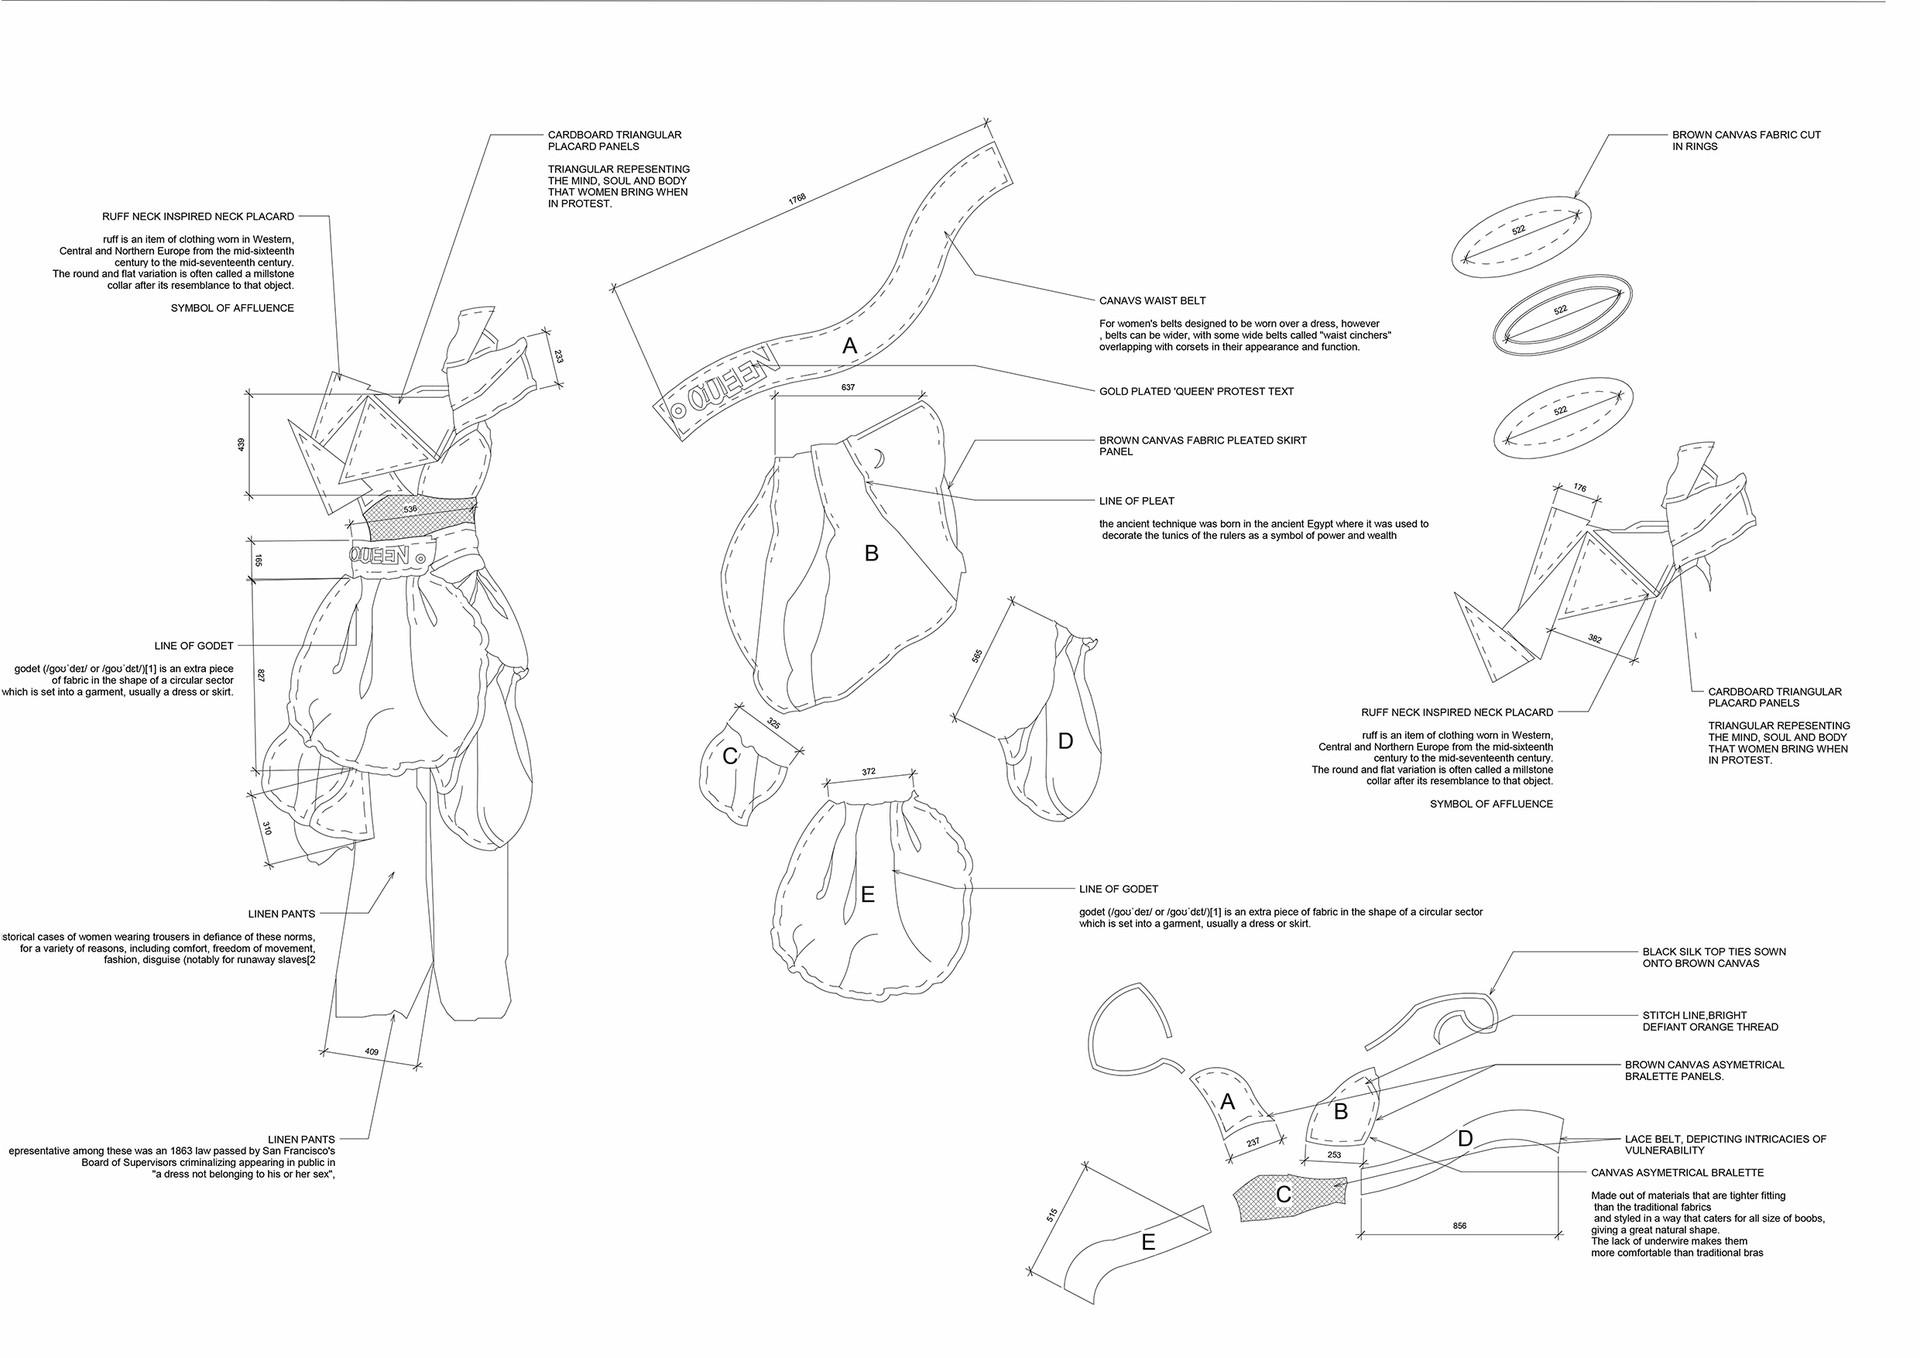 Tent Making on the Female Body assembly drawing. Mathenjwa, SS. Unit 18. 2020.